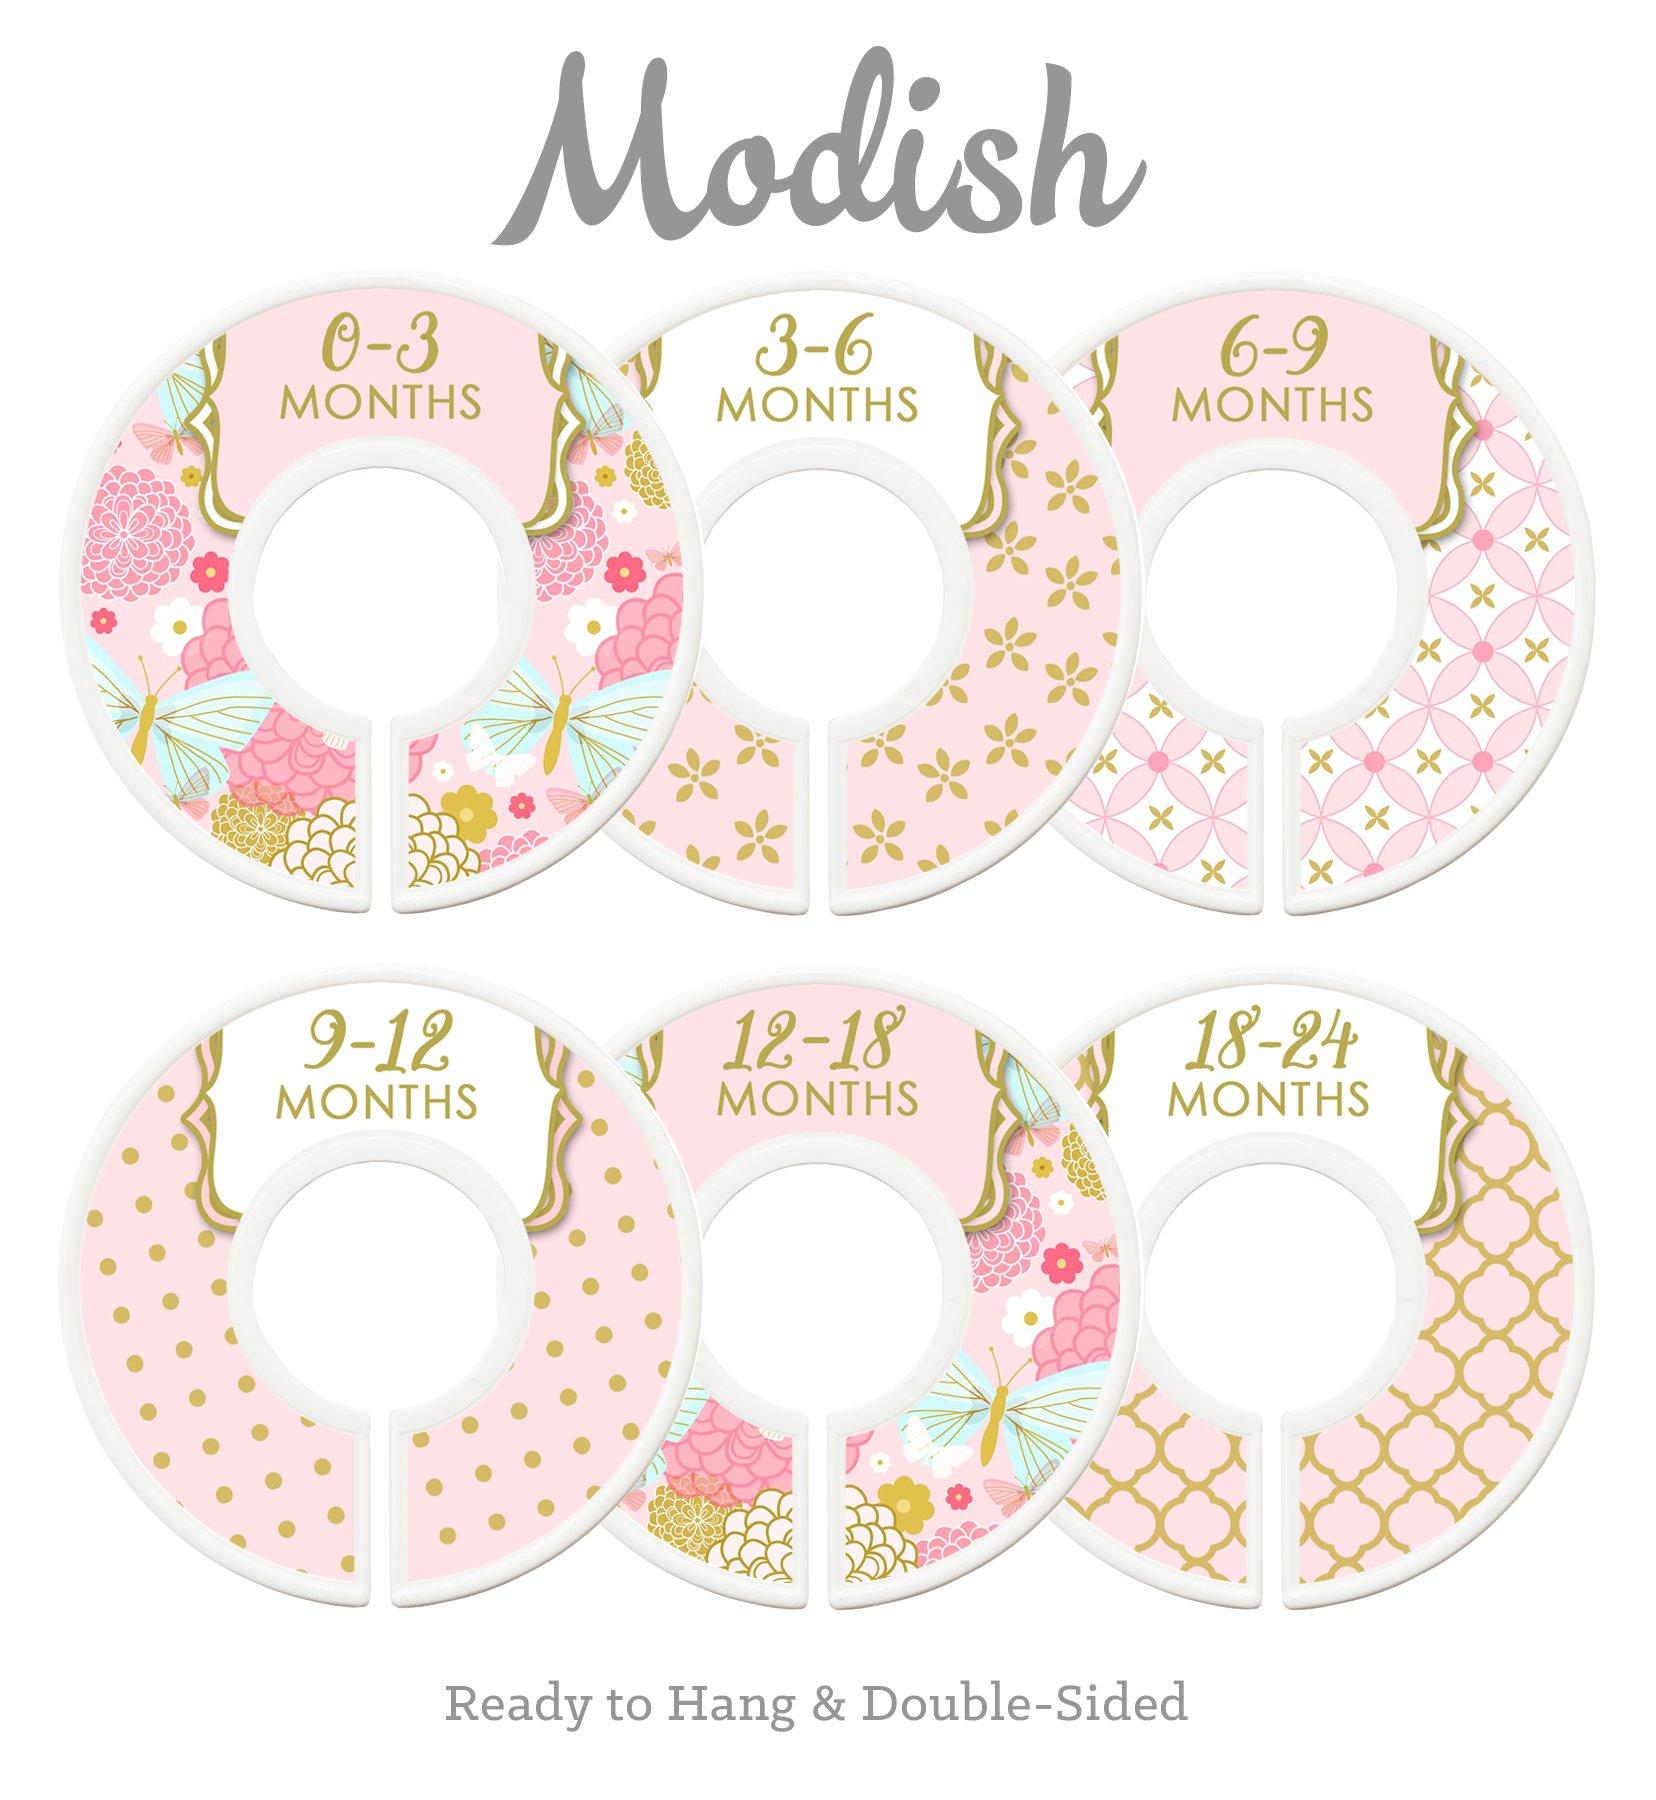 Modish Labels Baby Nursery Closet Dividers, Closet Organizers, Nursery Decor, Baby Girl, Pink, Gold, Confetti, Floral, Flowers